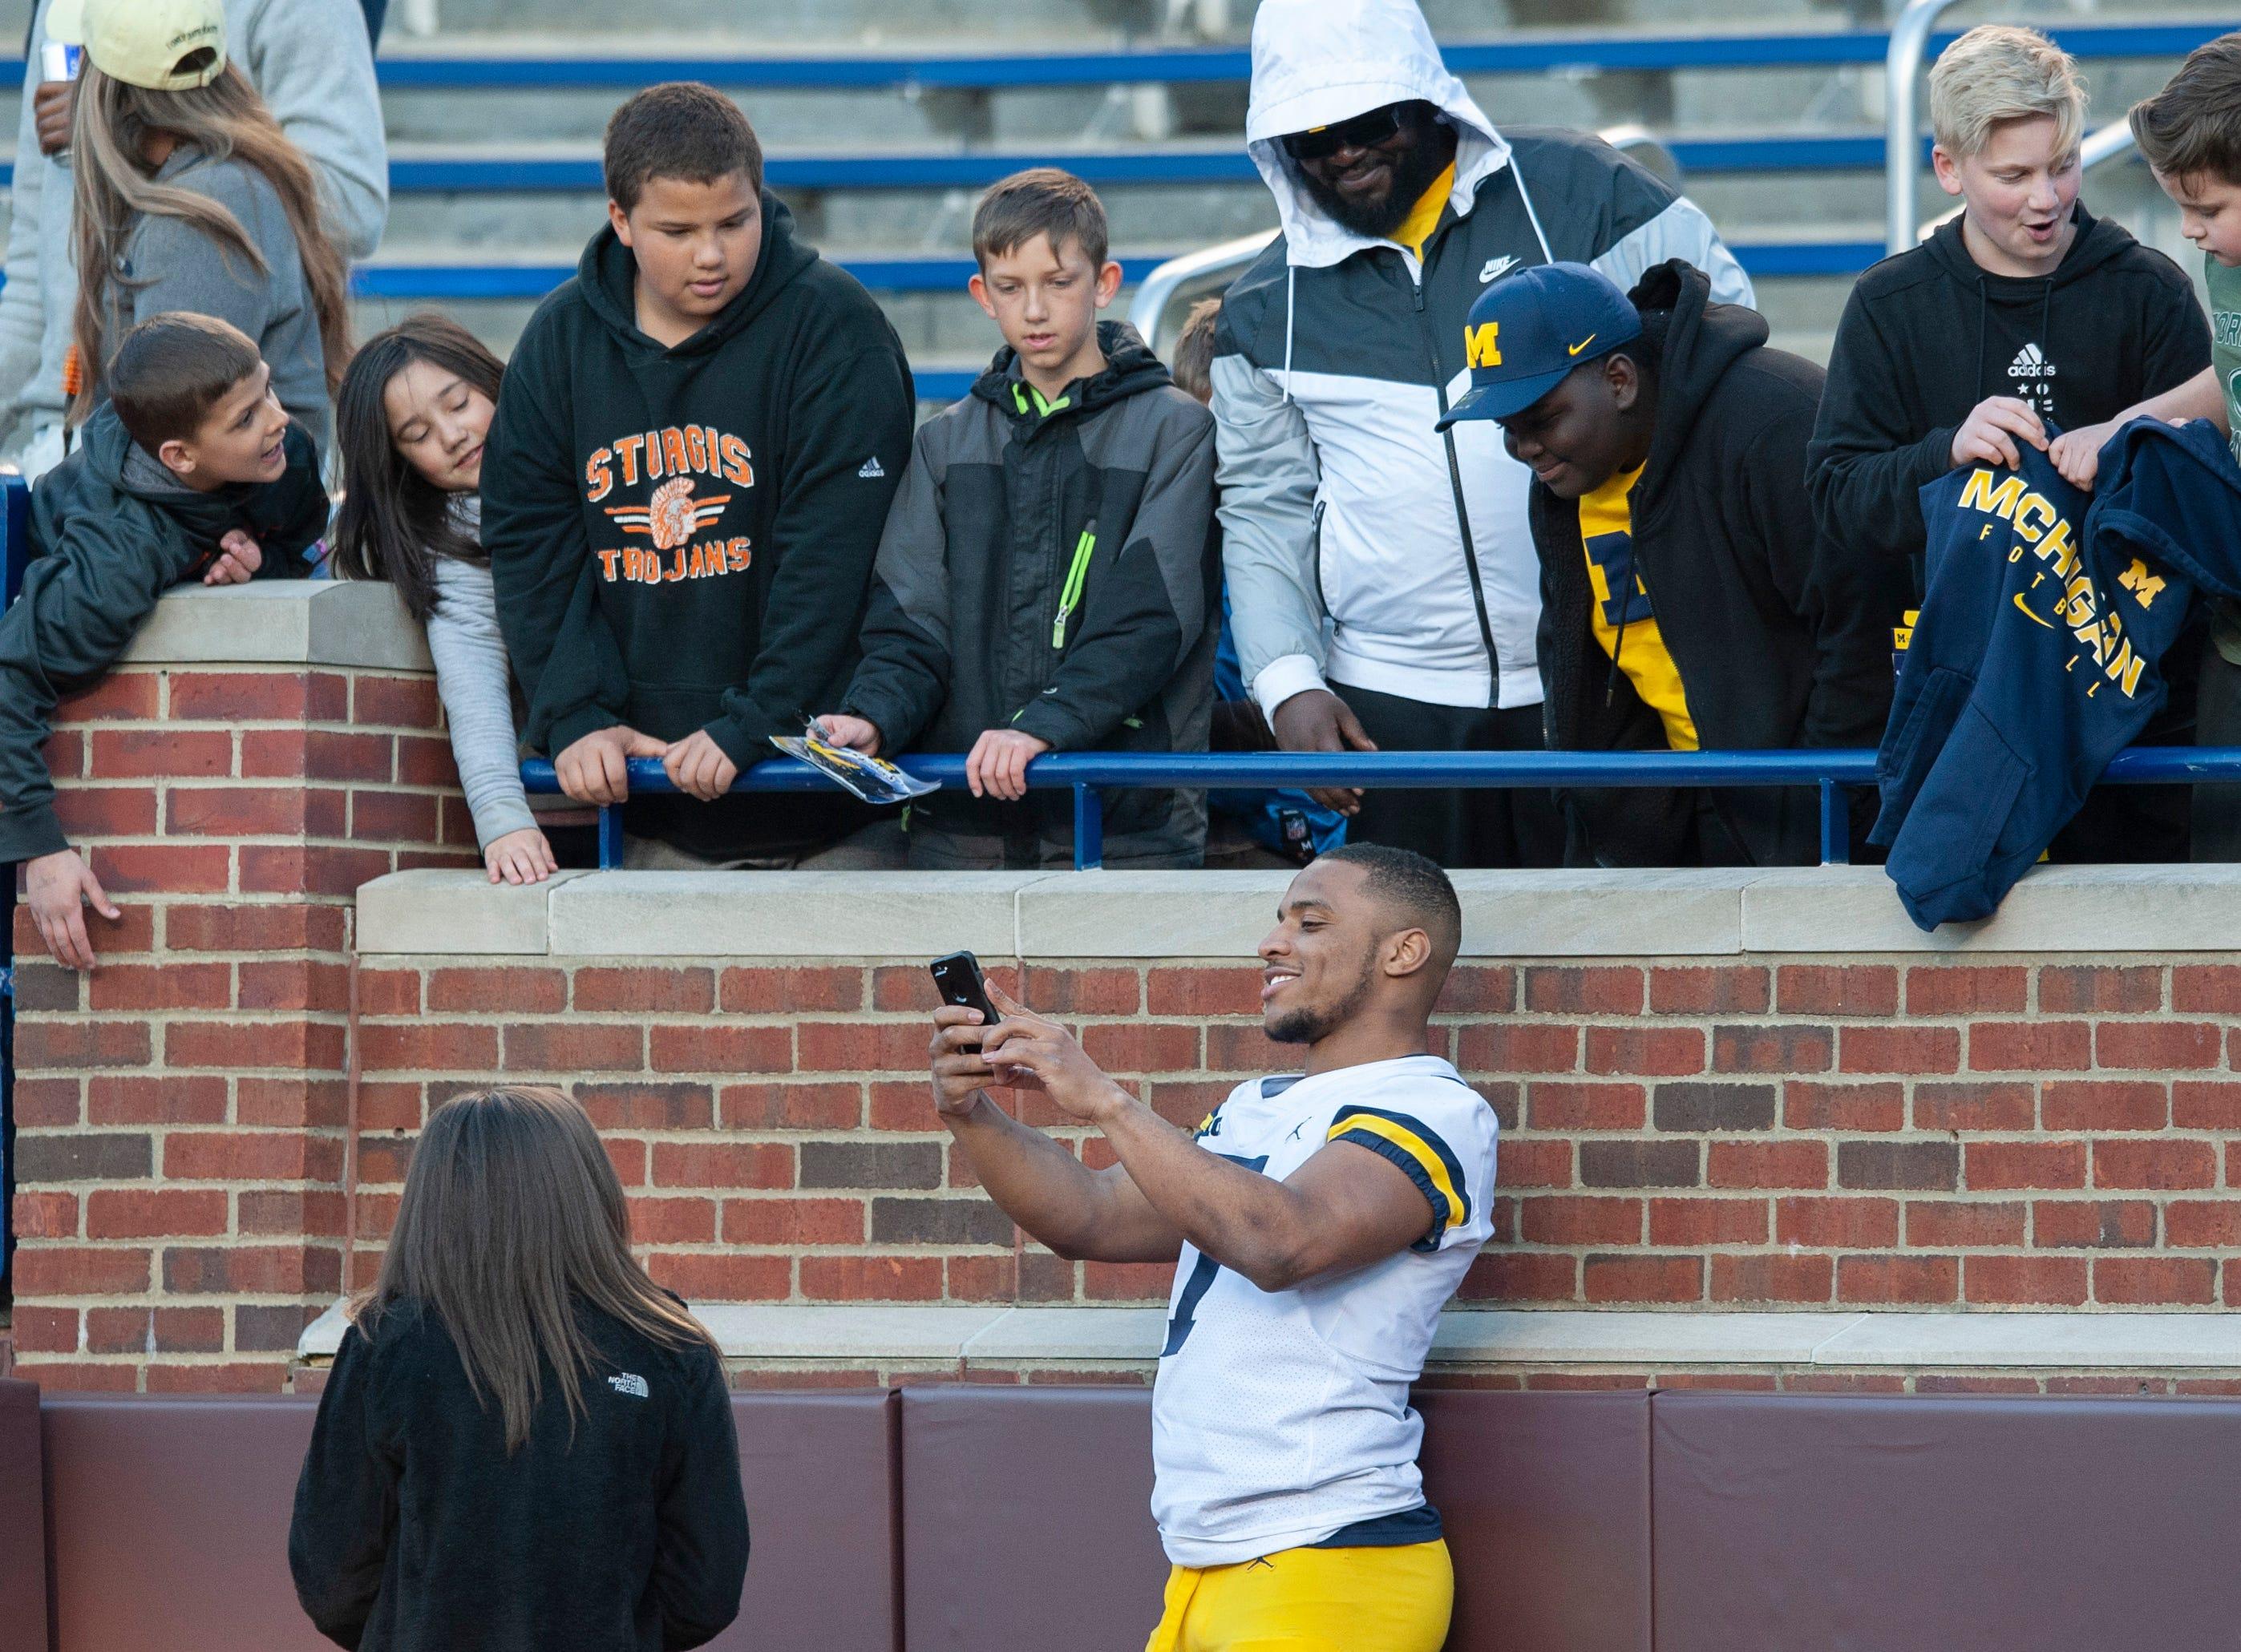 Michigan LB Khaleke Hudson takes a selfie with fans.  *** University of Michigan football spring game at Michigan Stadium in Ann Arbor on Saturday, April 13, 2019. (John T. Greilick, The Detroit News)